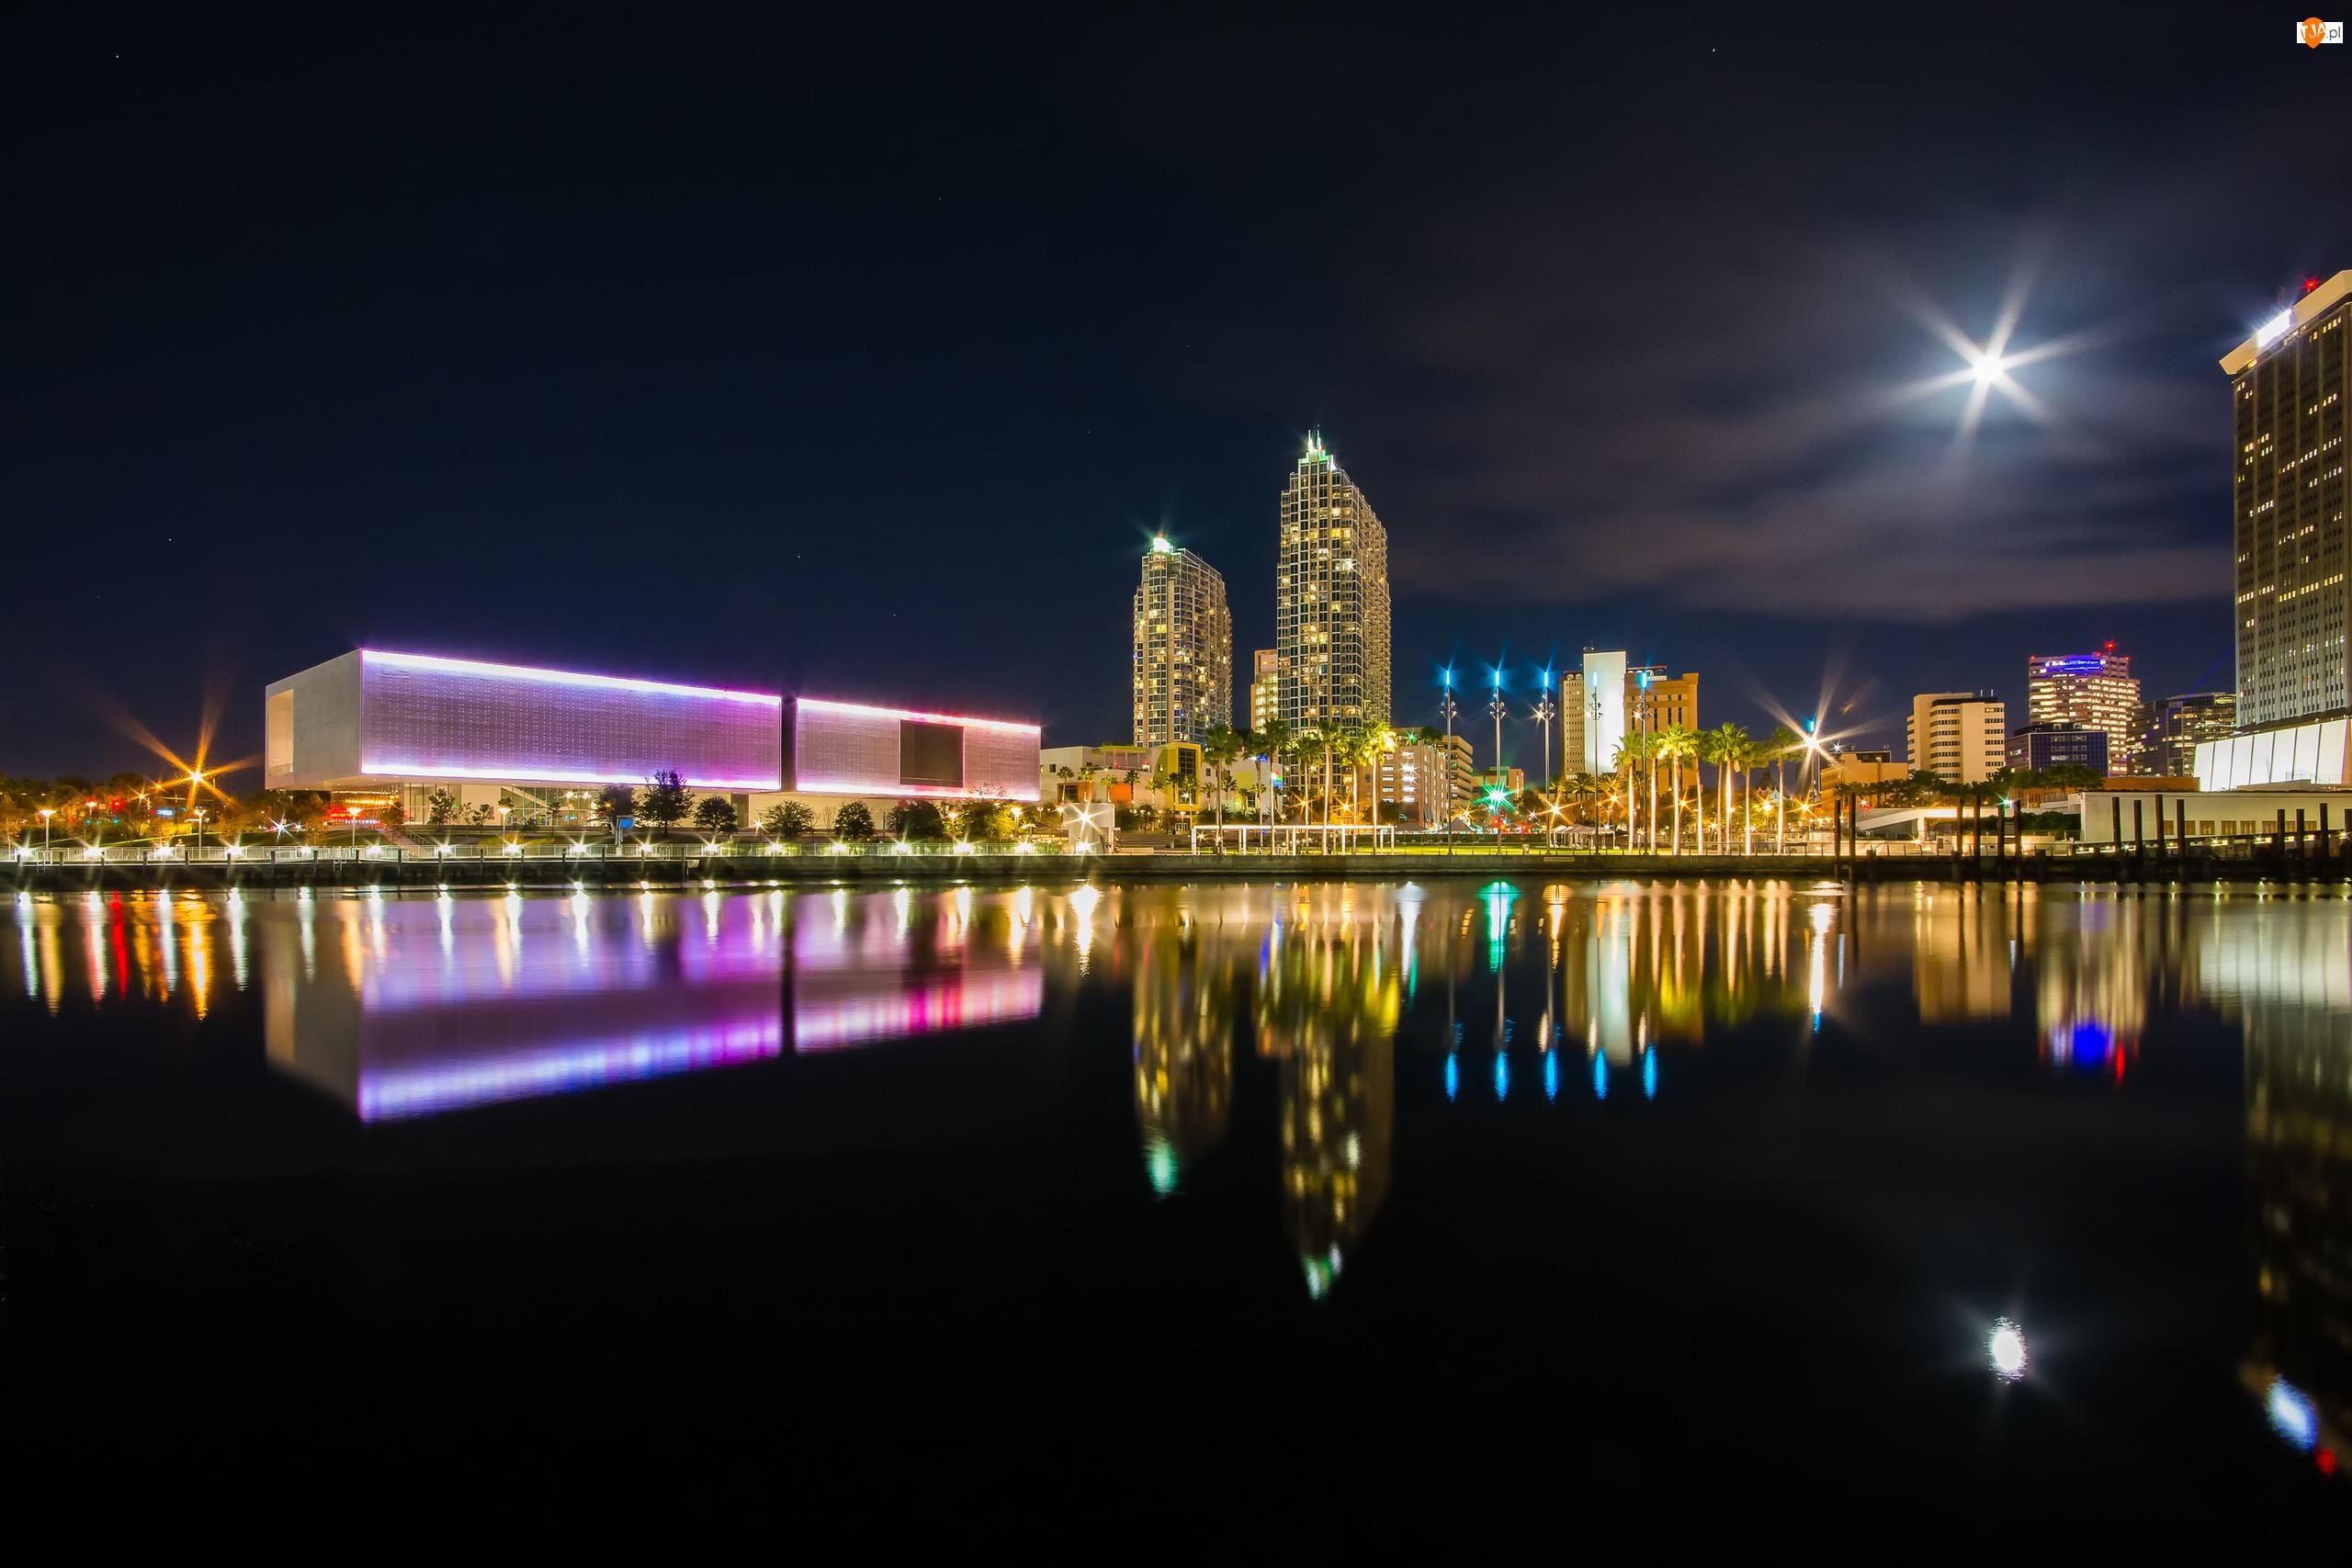 Domy, Park Curtis Hixon Waterfront, Stan Floryda, Stany Zjednoczone, Miasto nocą, Tampa, Rzeka Hillsborough